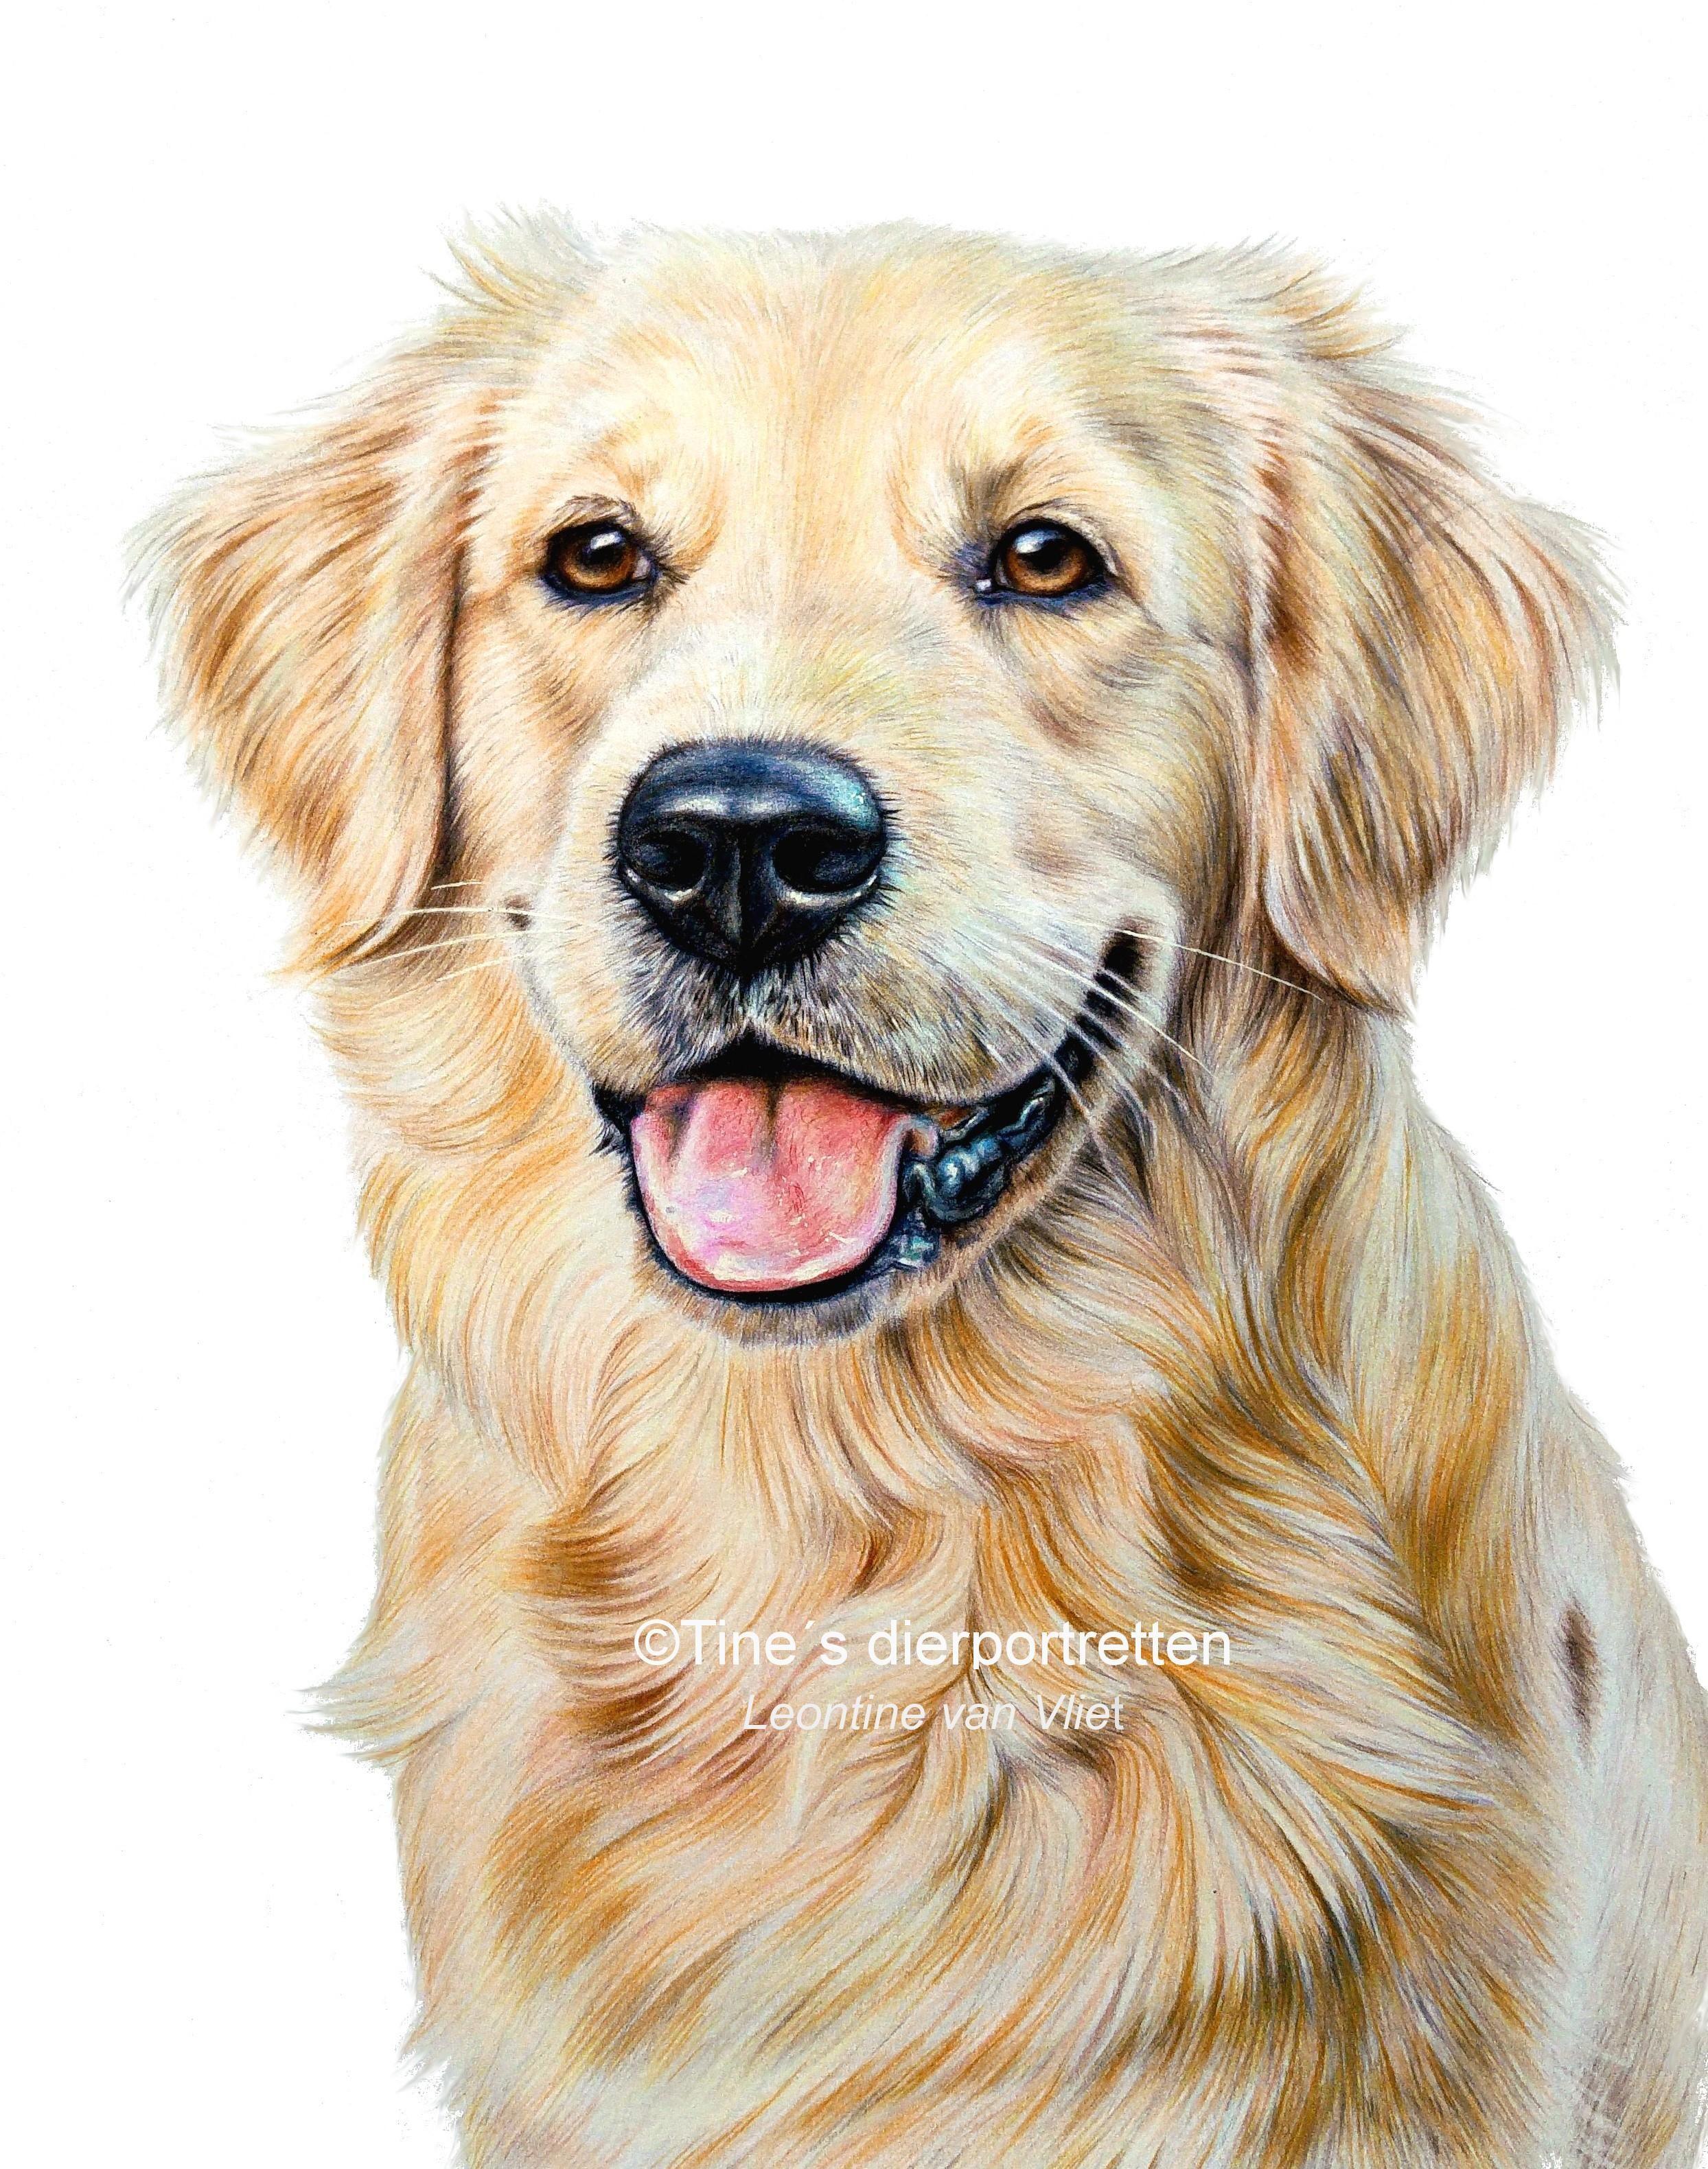 Pin By Regenbogen Art Books On Dogs In 2020 Dog Portrait Drawing Dog Paintings Golden Retriever Drawing [ 3160 x 2488 Pixel ]